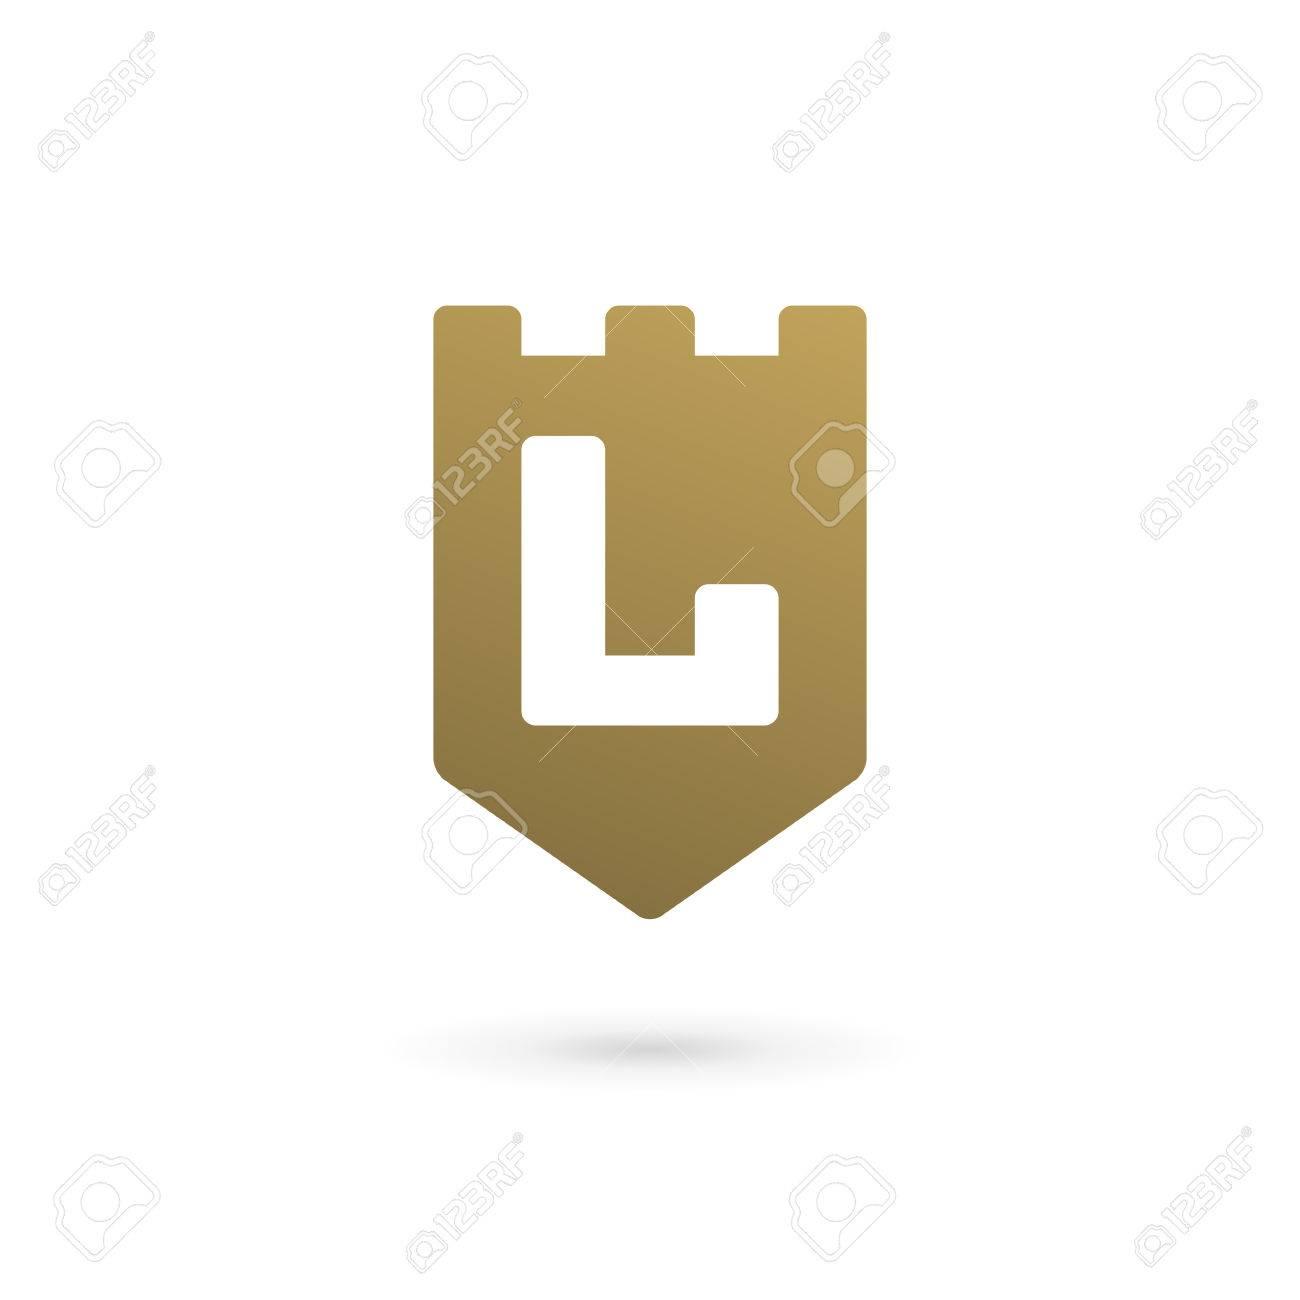 letter l shield logo icon design template elements stock vector 78360401